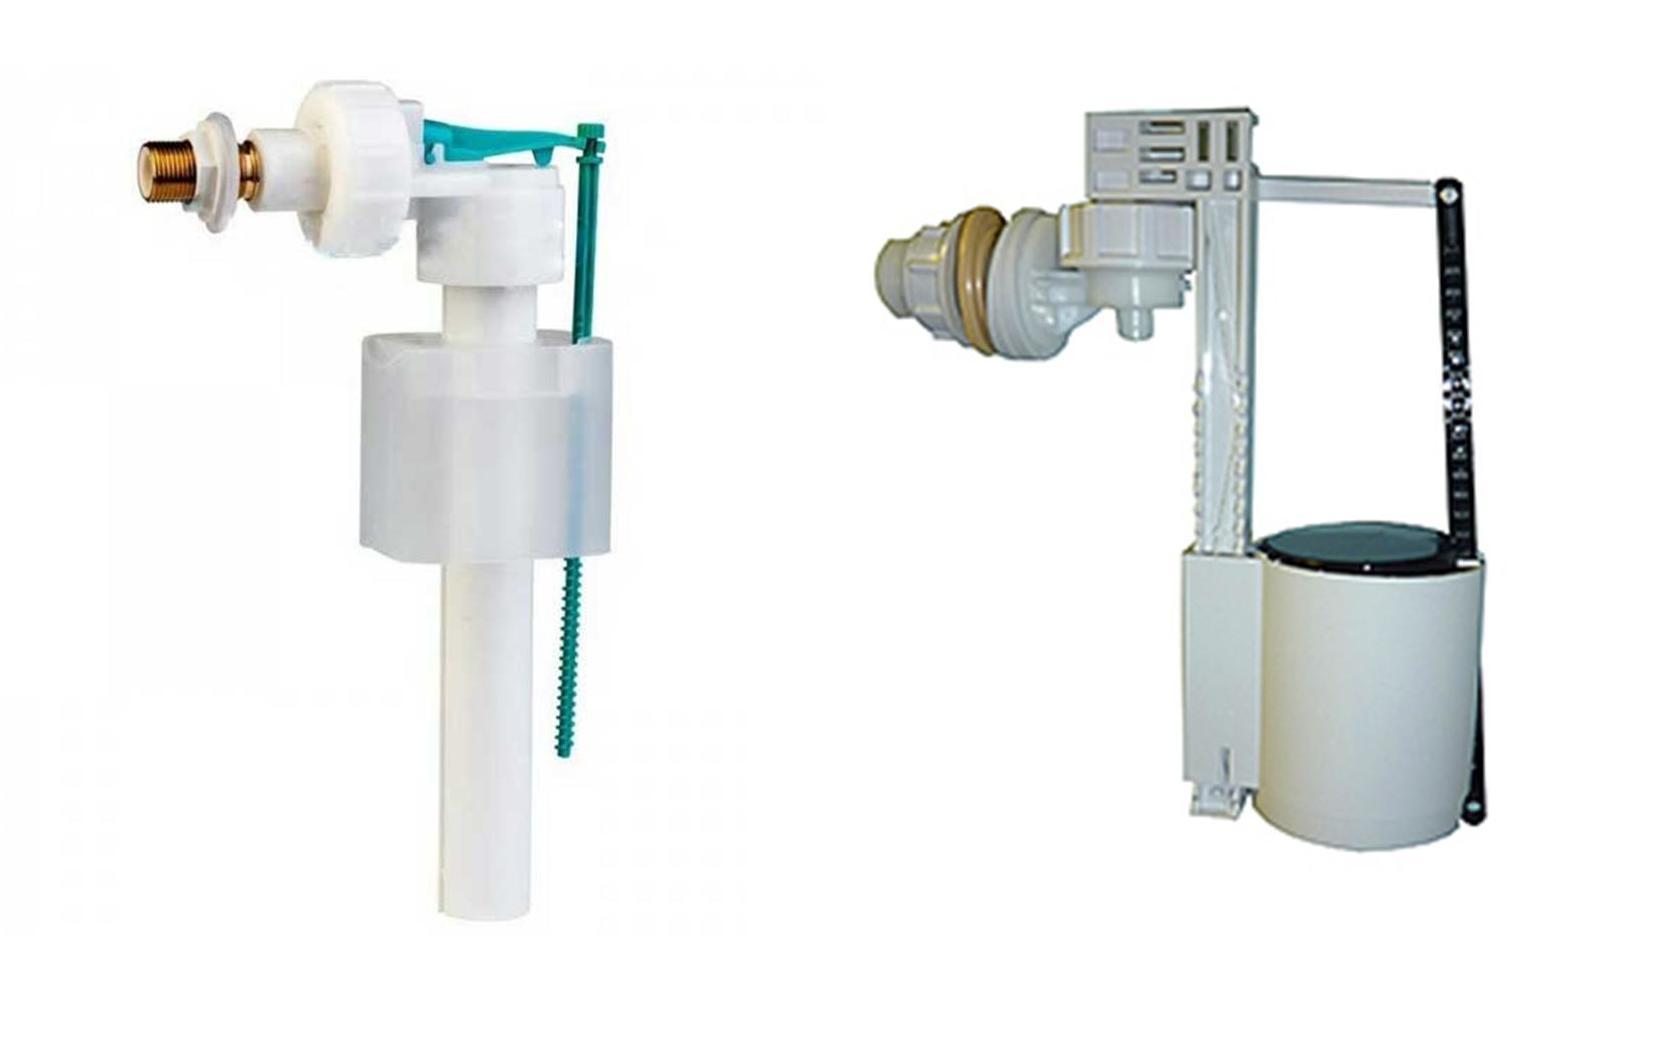 Мембрана запорная бачка унитаза - все о канализации